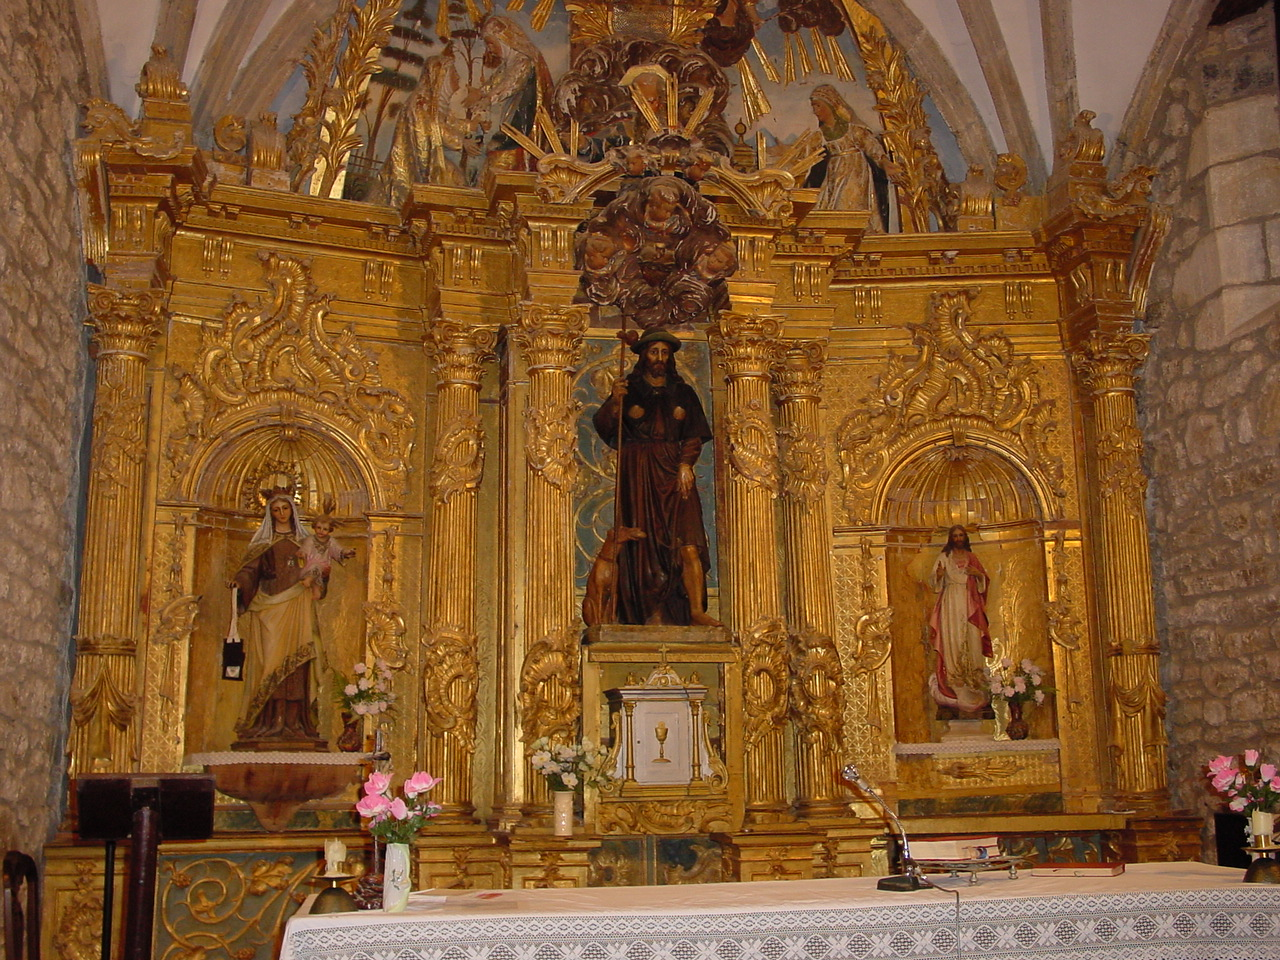 File:17 Cantabria San Roque Riomiera iglesia lou.JPG - Wikimedia Commons